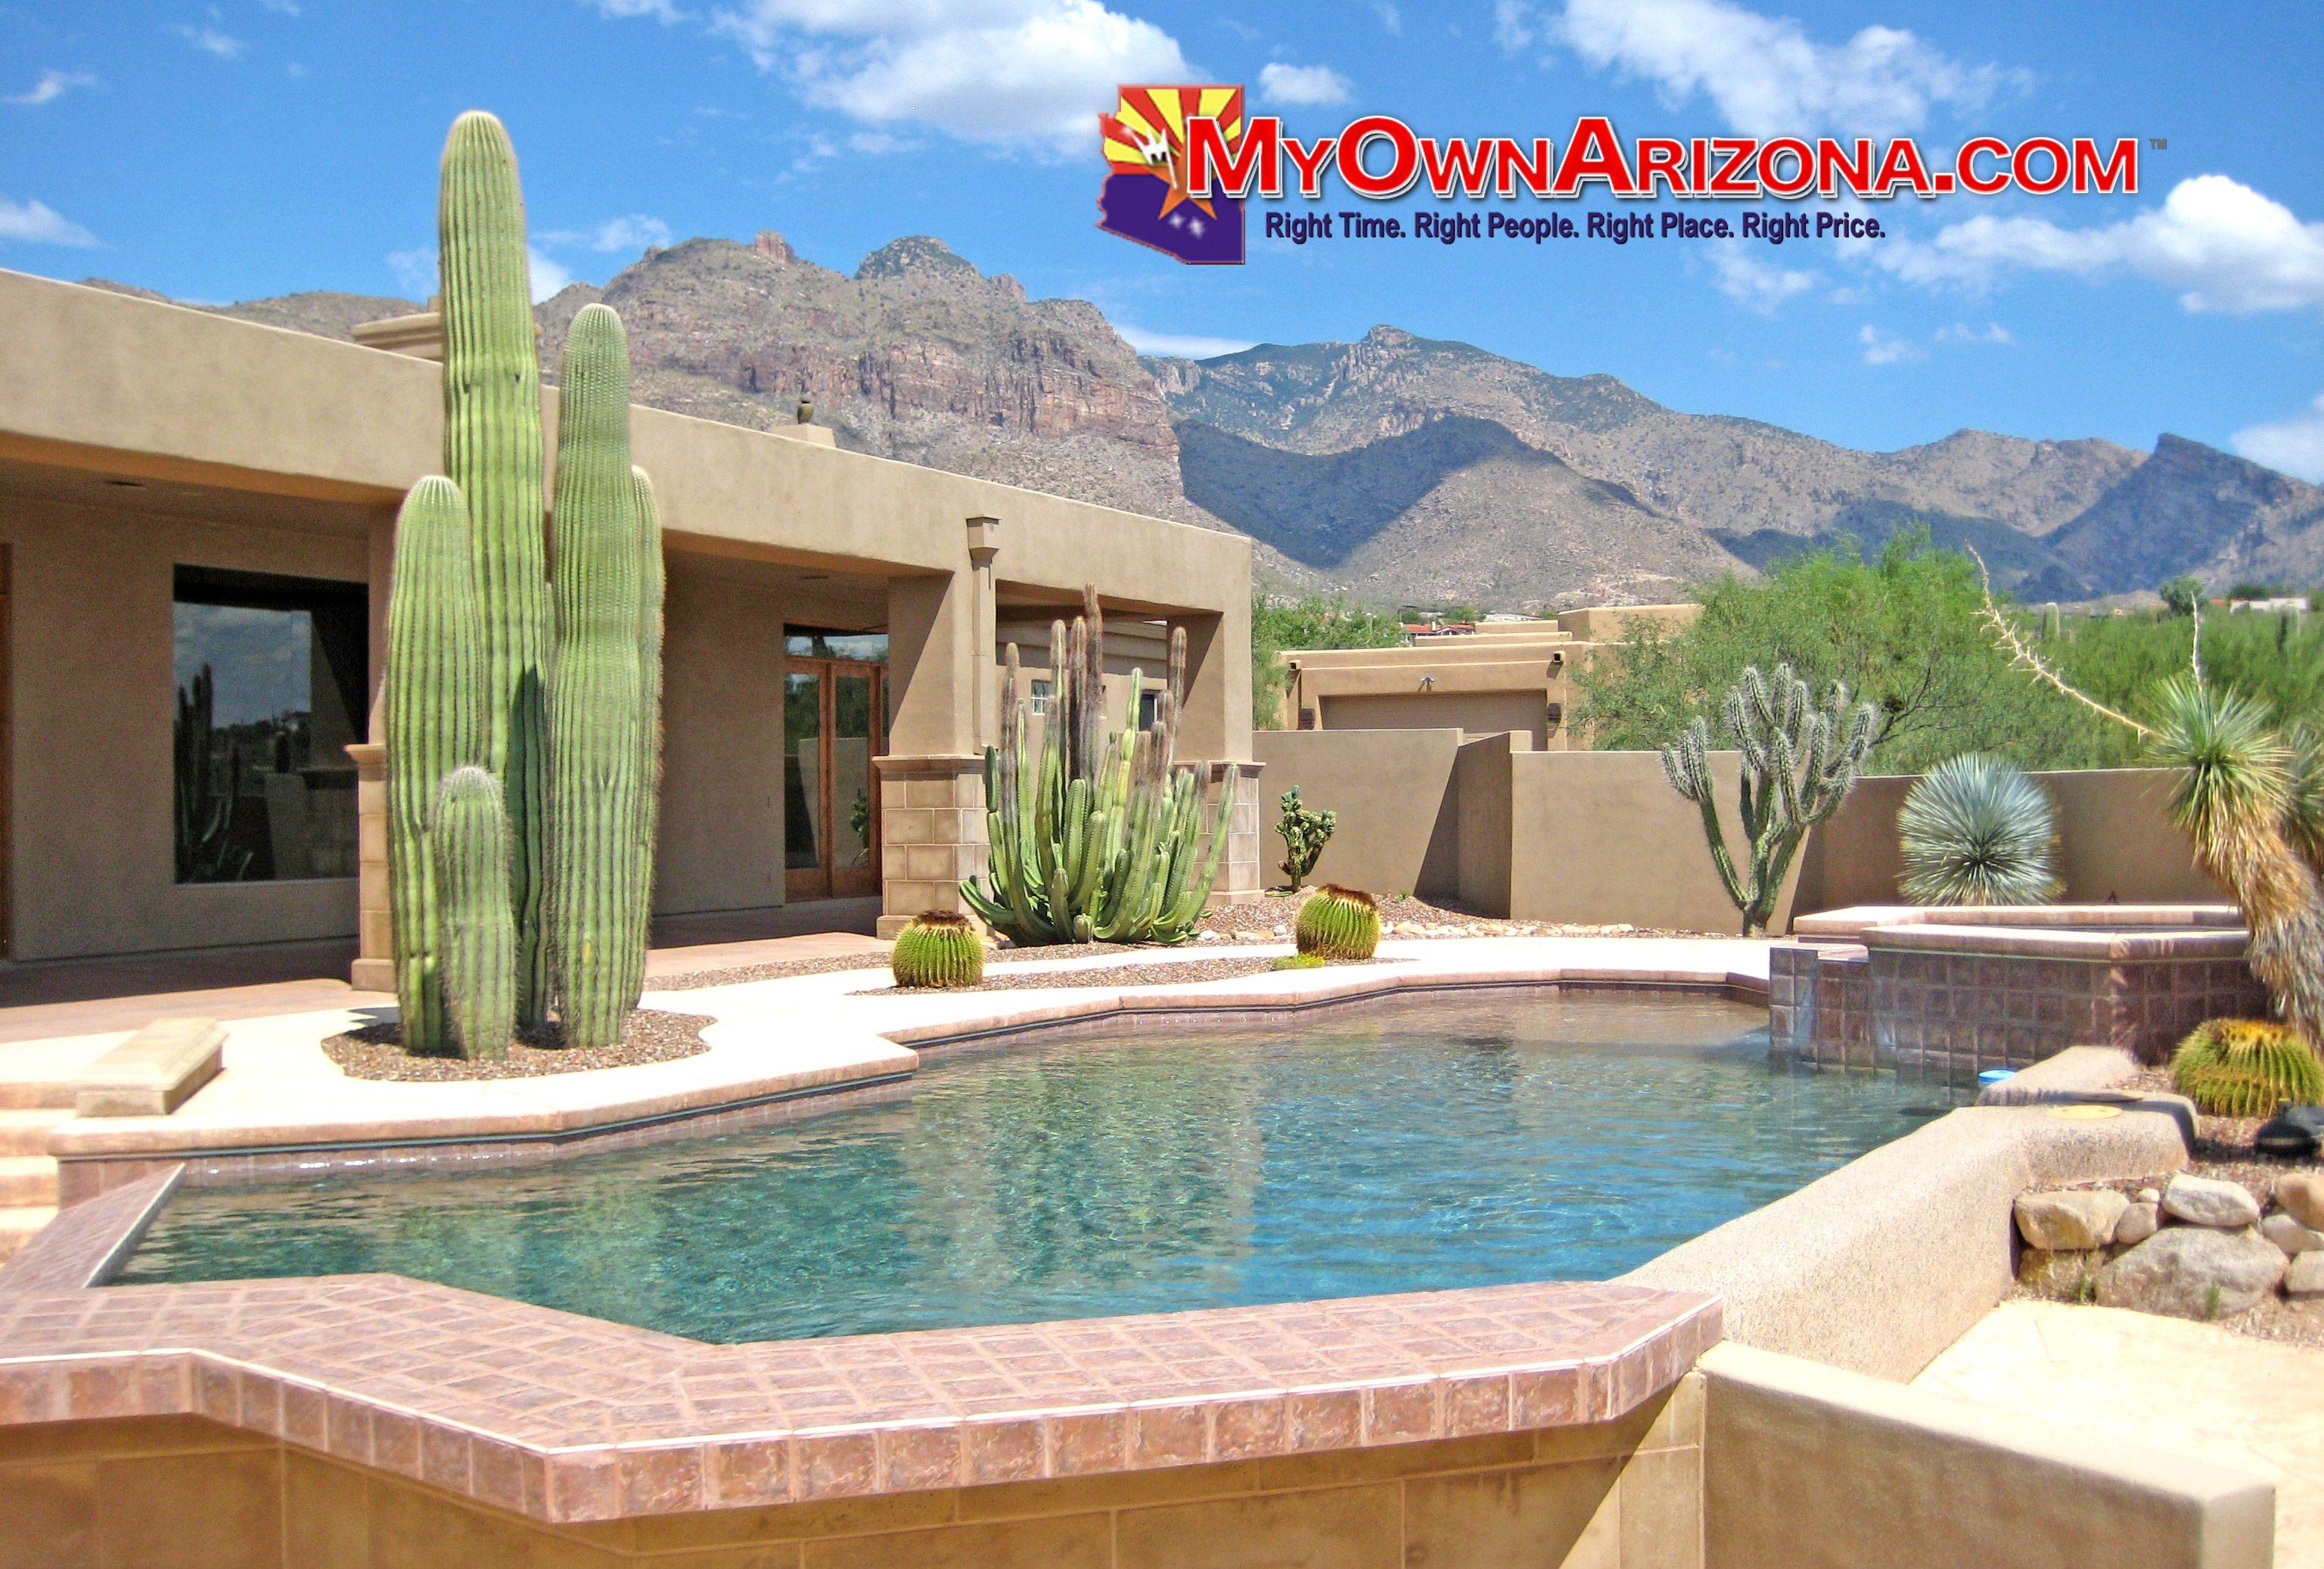 22 Swimming Pool Contractors Tucson Az Decor23